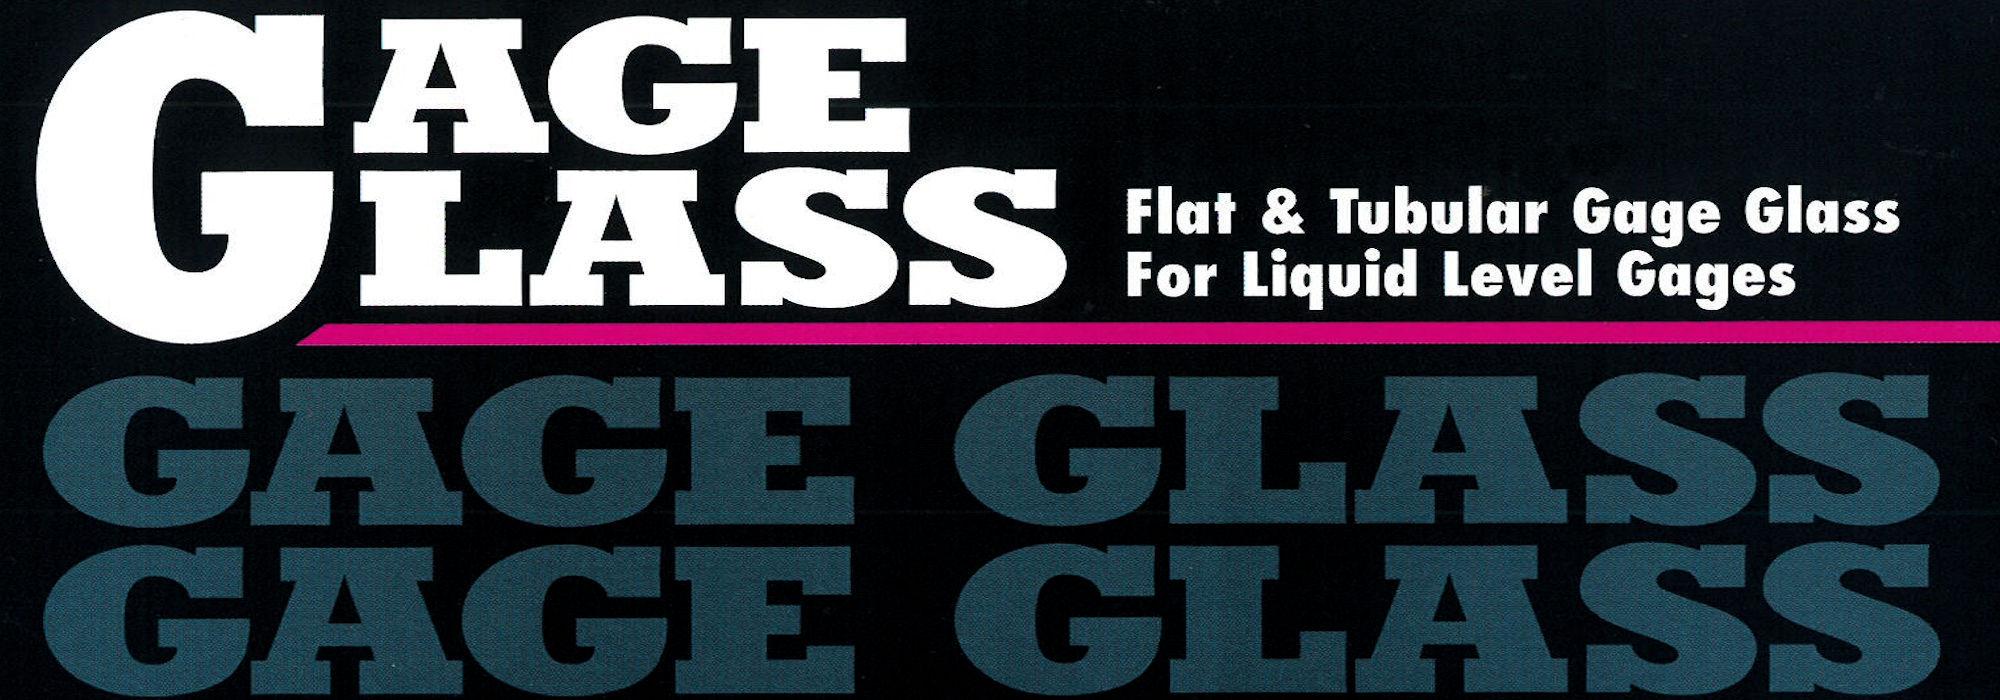 Gage-Glass-catalog